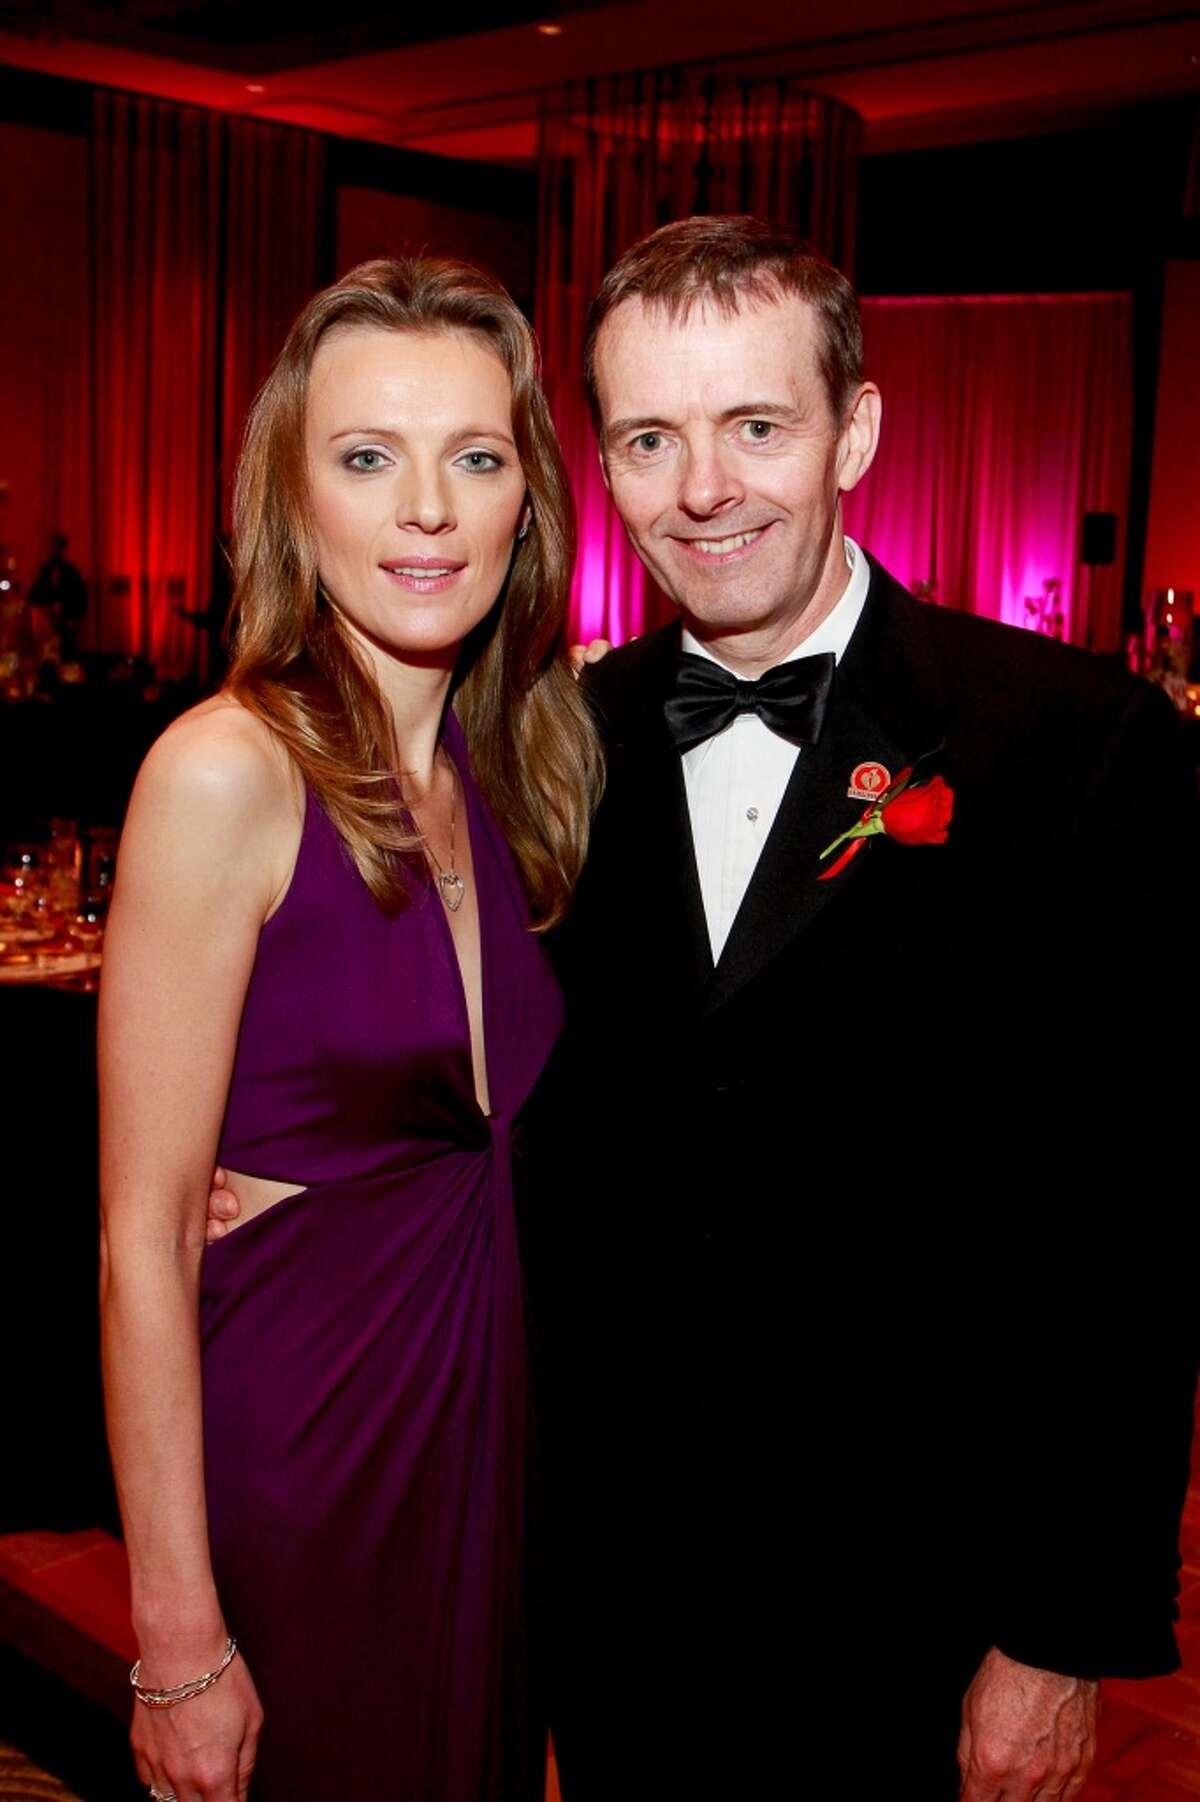 Yulia Pearce and honoree Dr. Daniel Penny